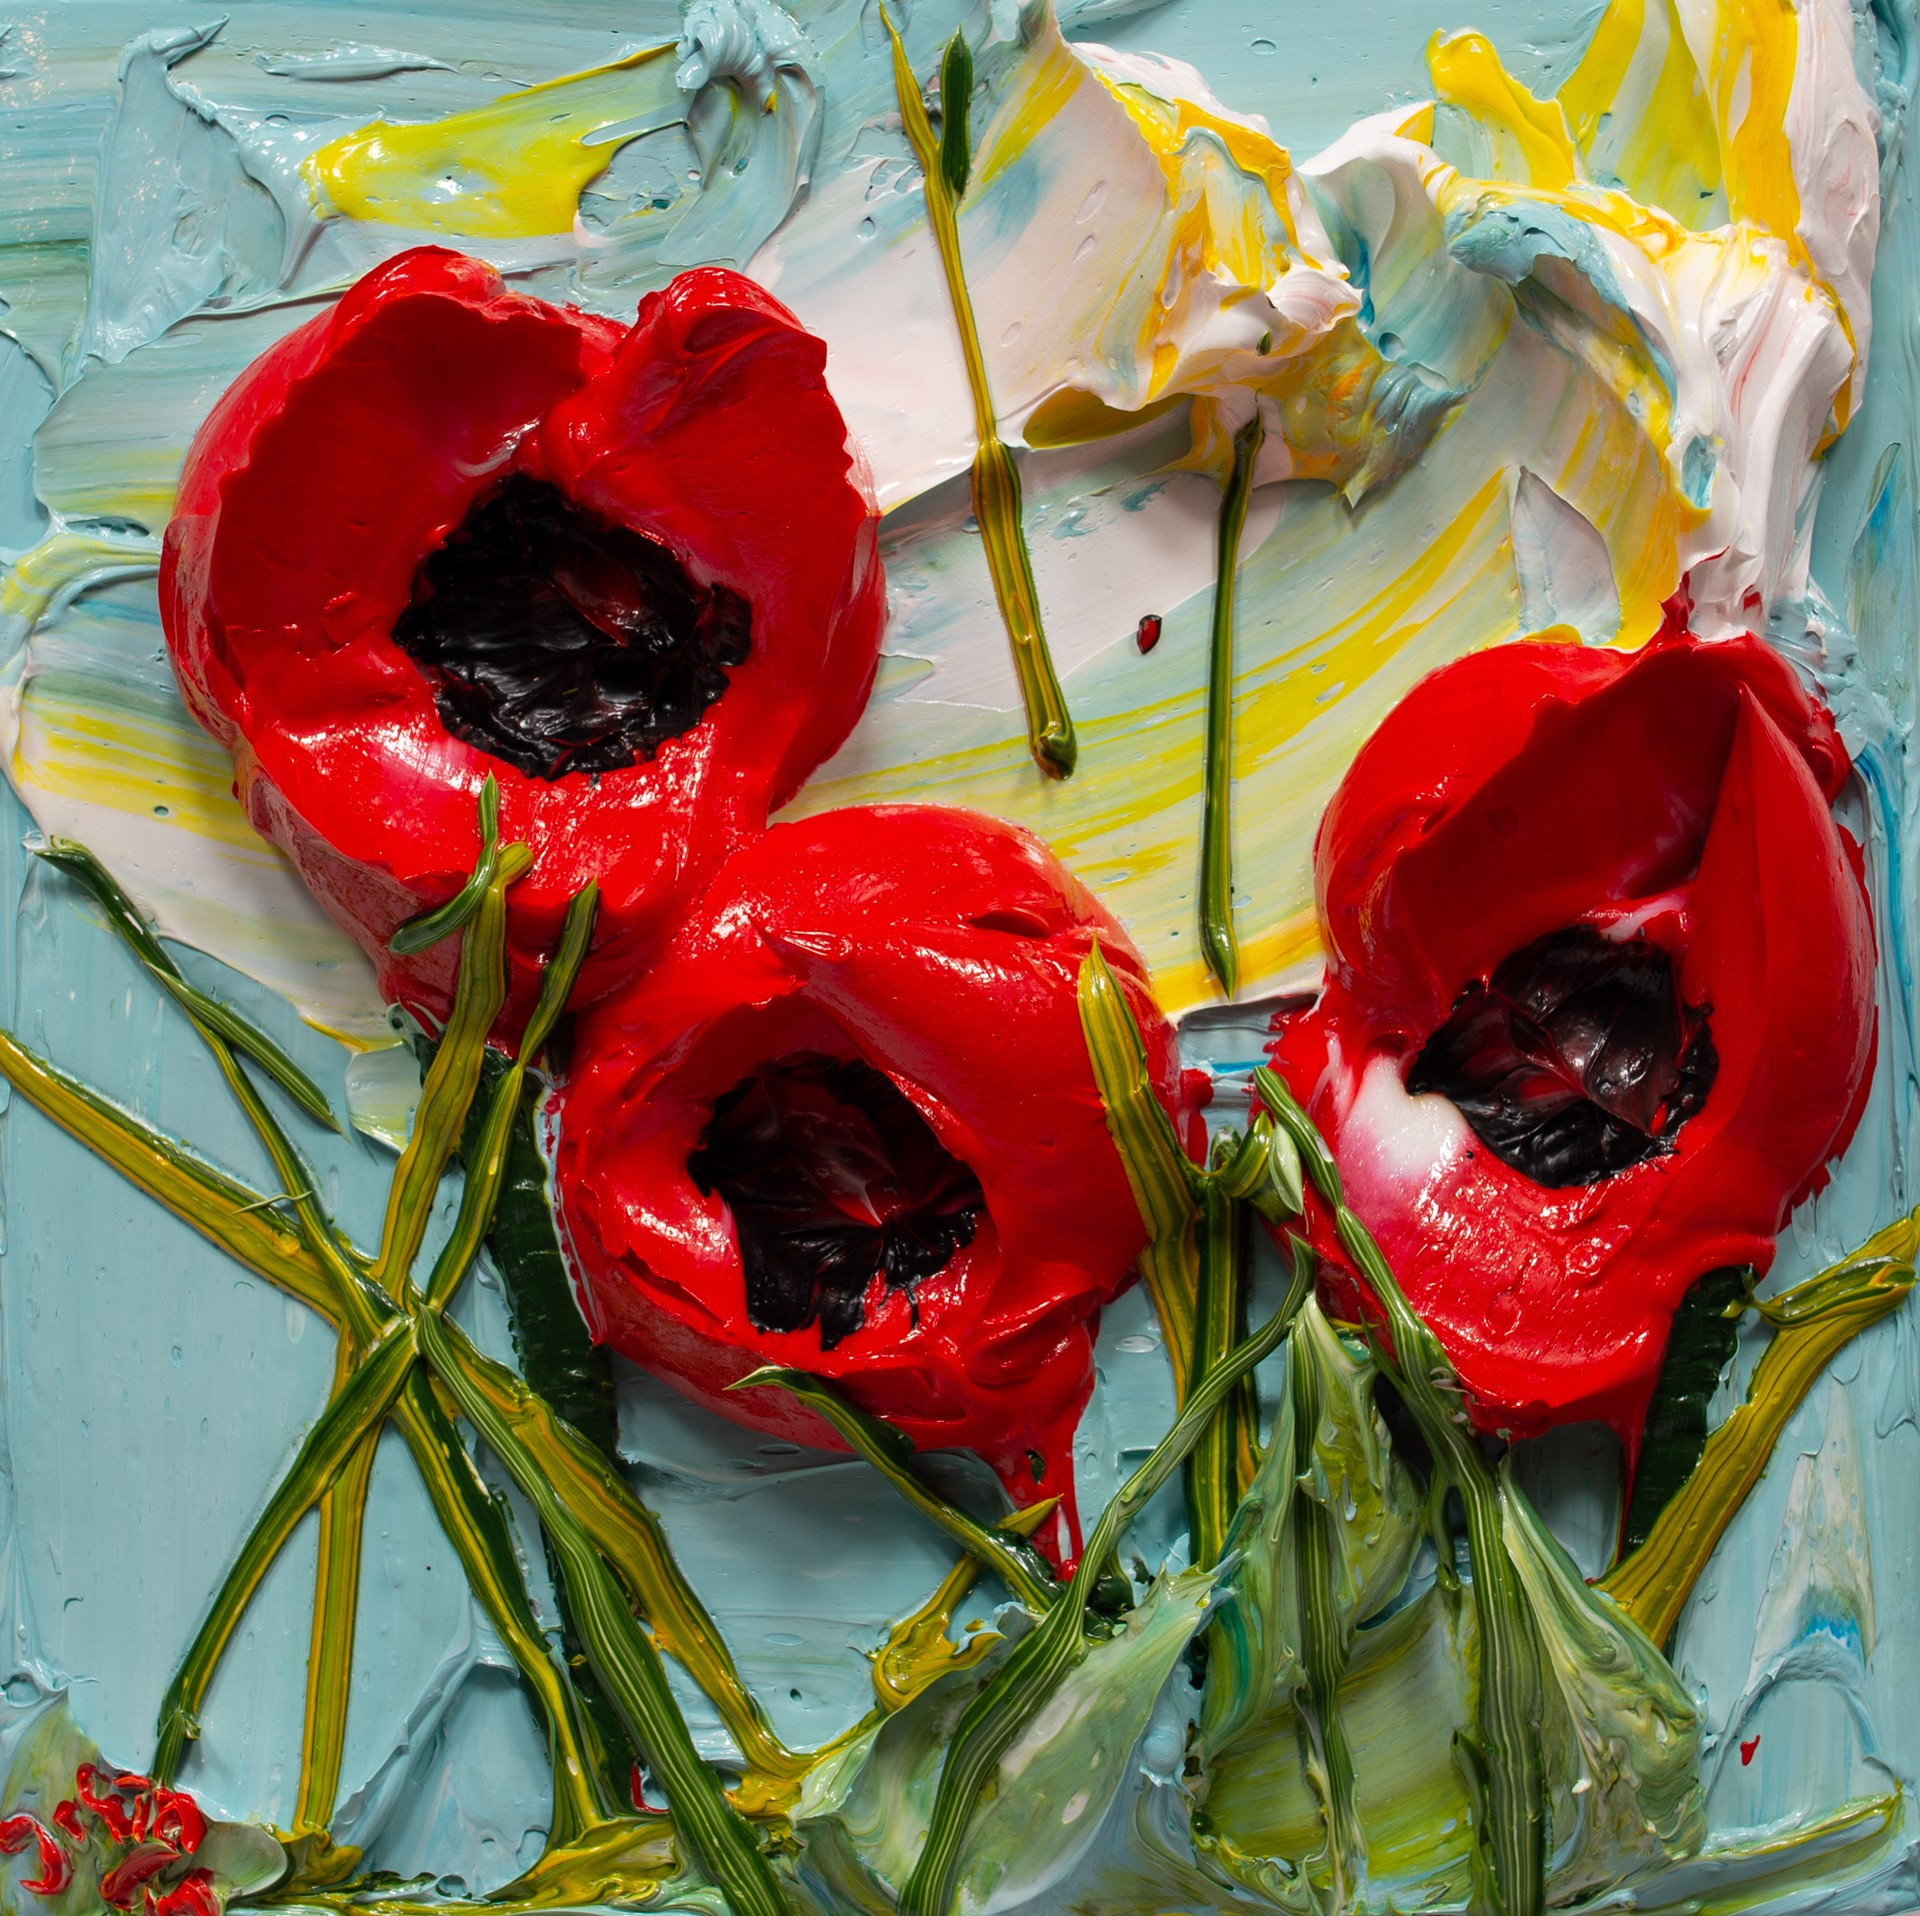 POPPY FLOWERS-PF-12X12-2019-180 by JUSTIN GAFFREY